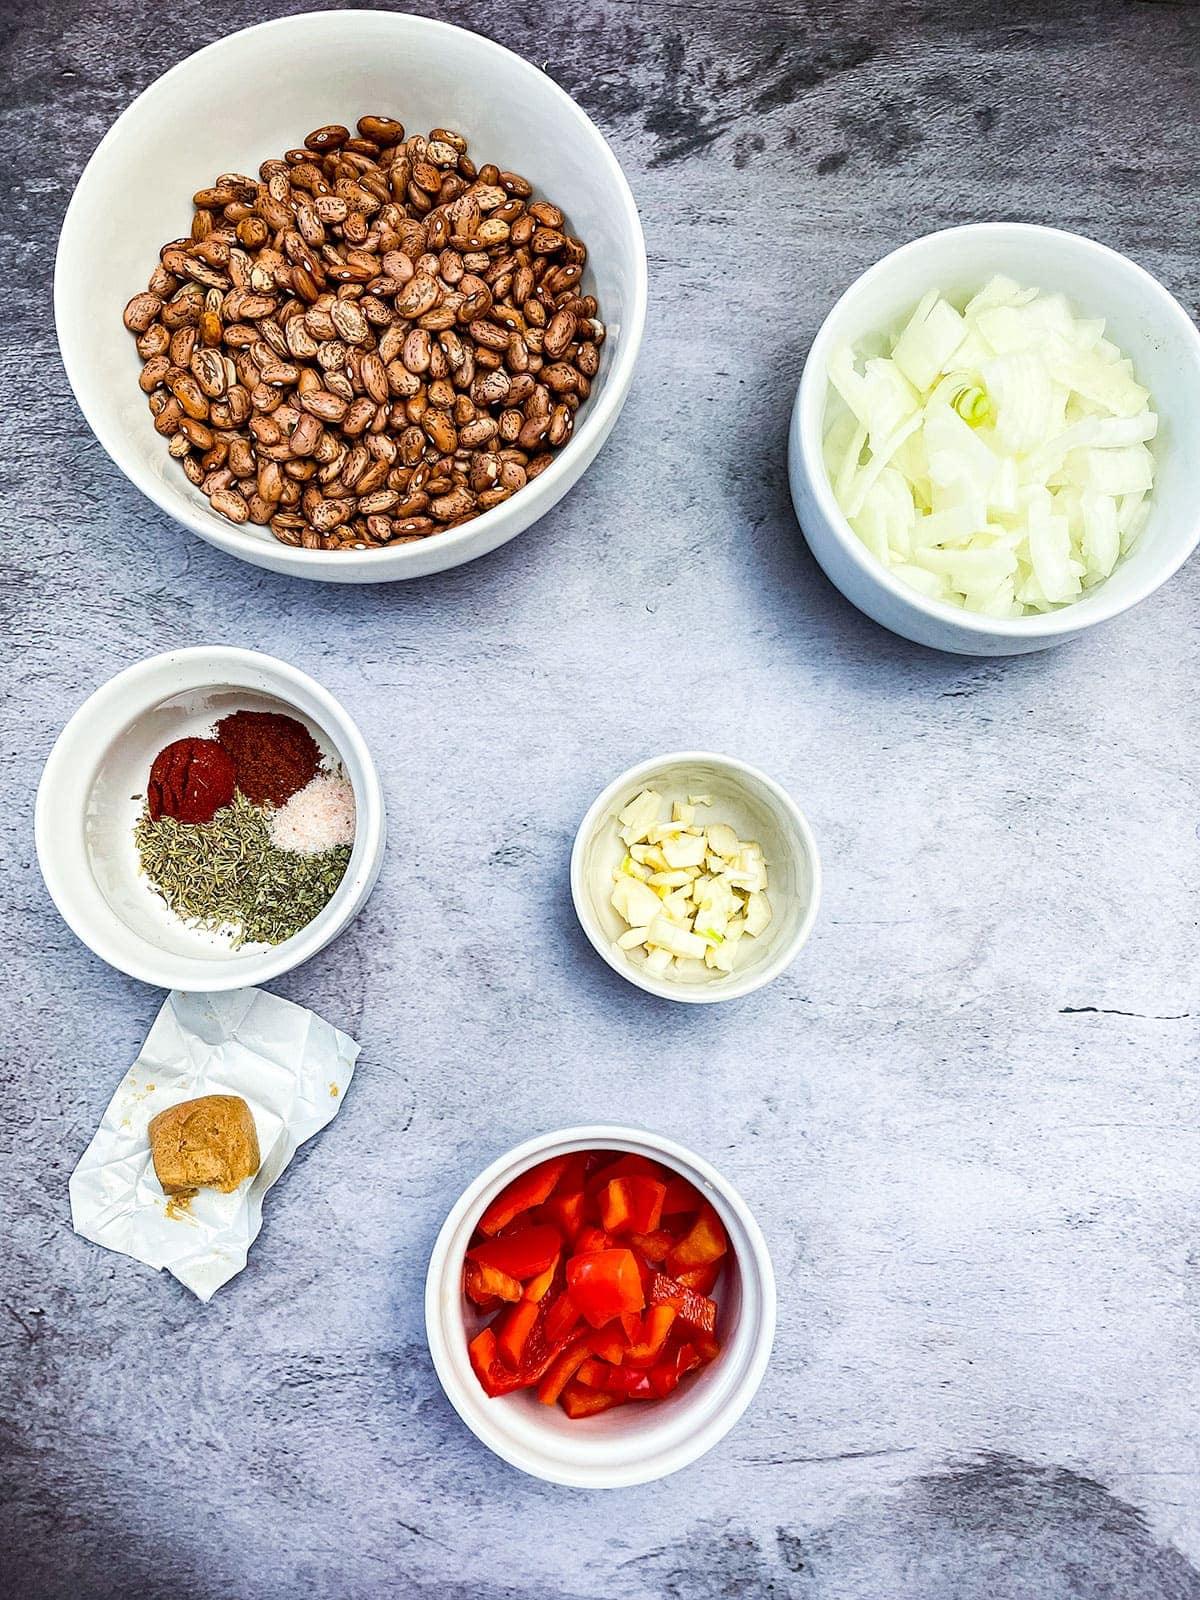 Instant Pot Pinto beans ingredients